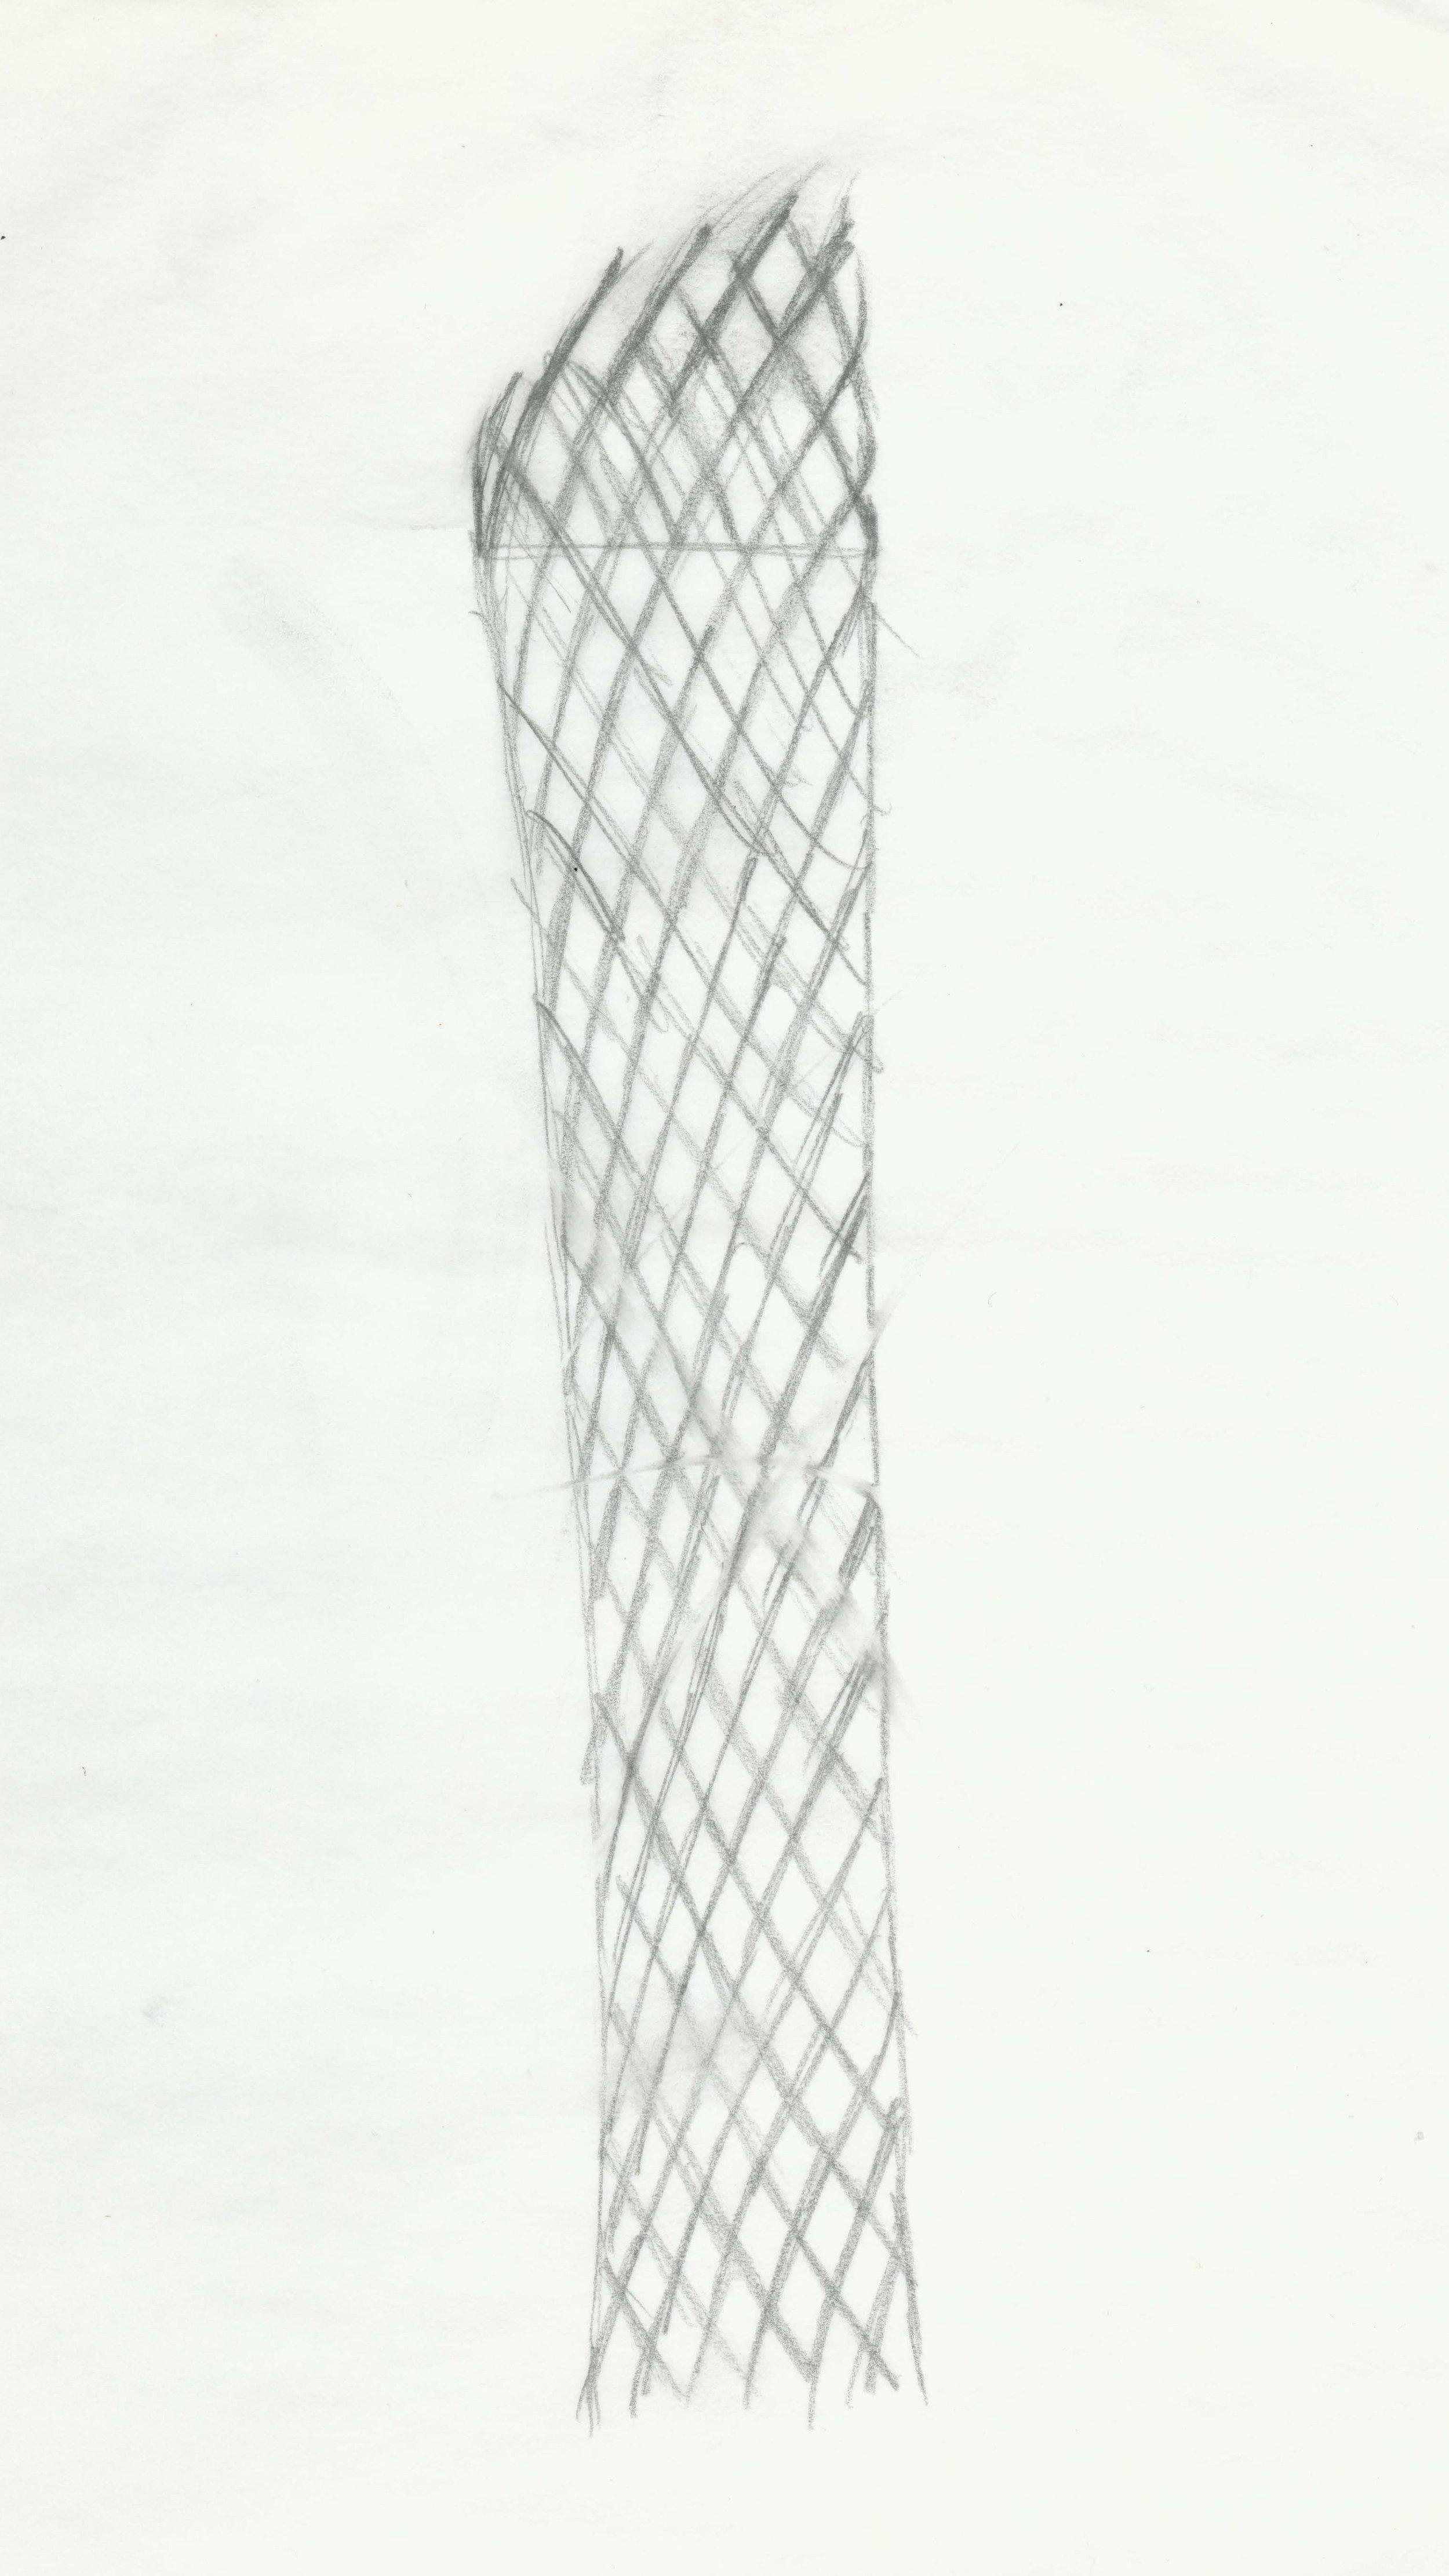 Skyscraper - Drawings 1.jpg